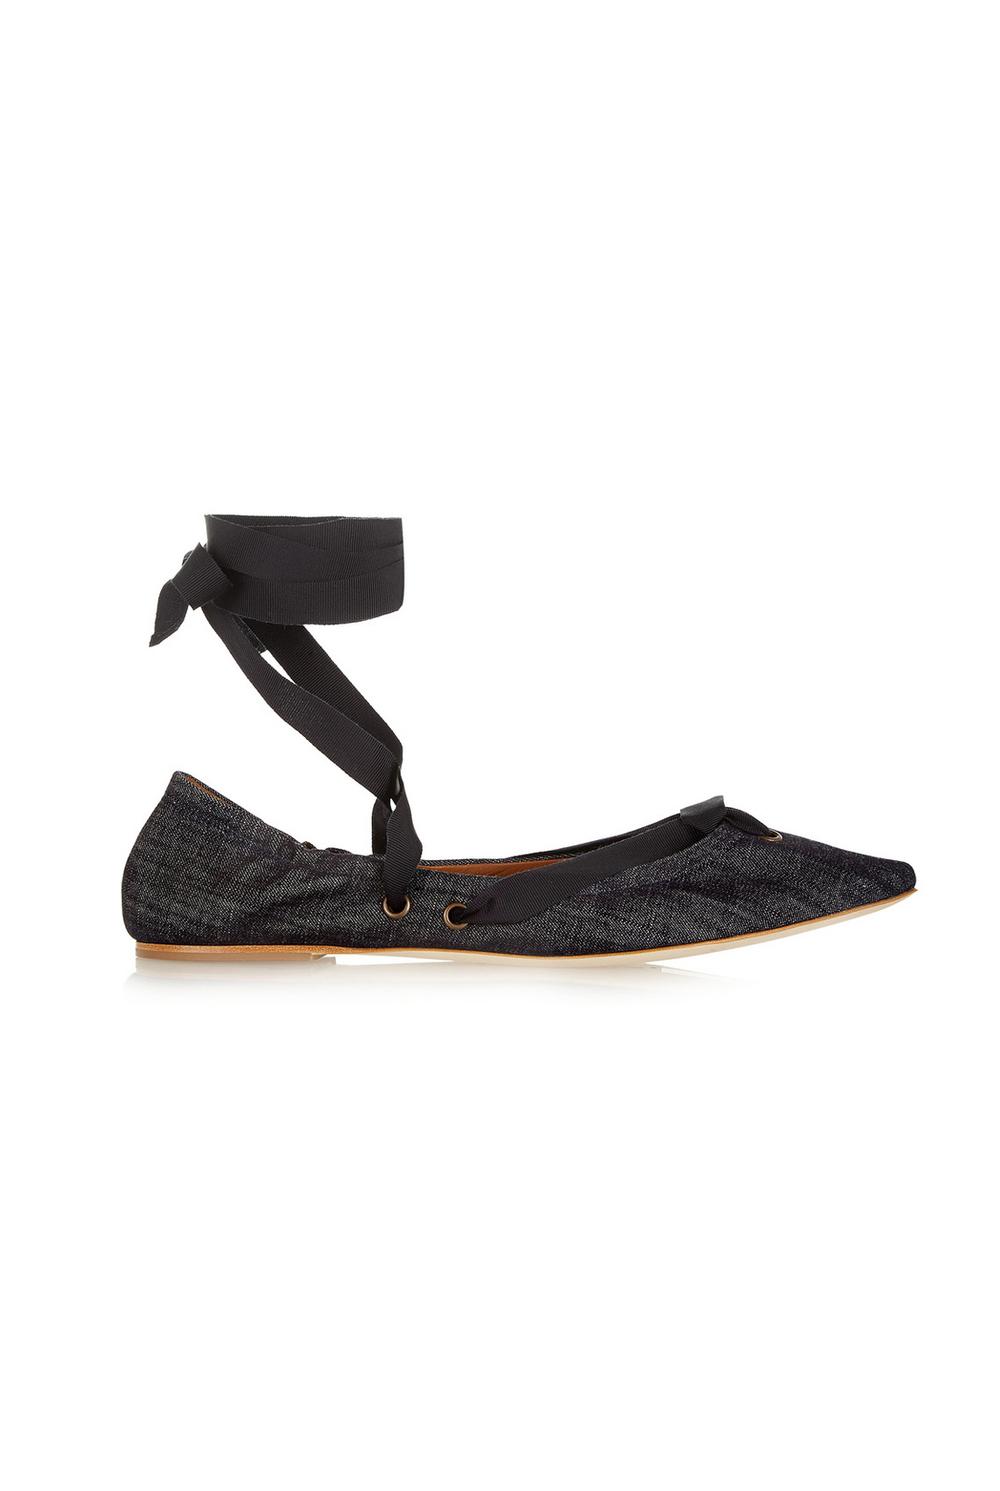 07-spring-denim-trends-shoes-05.jpg